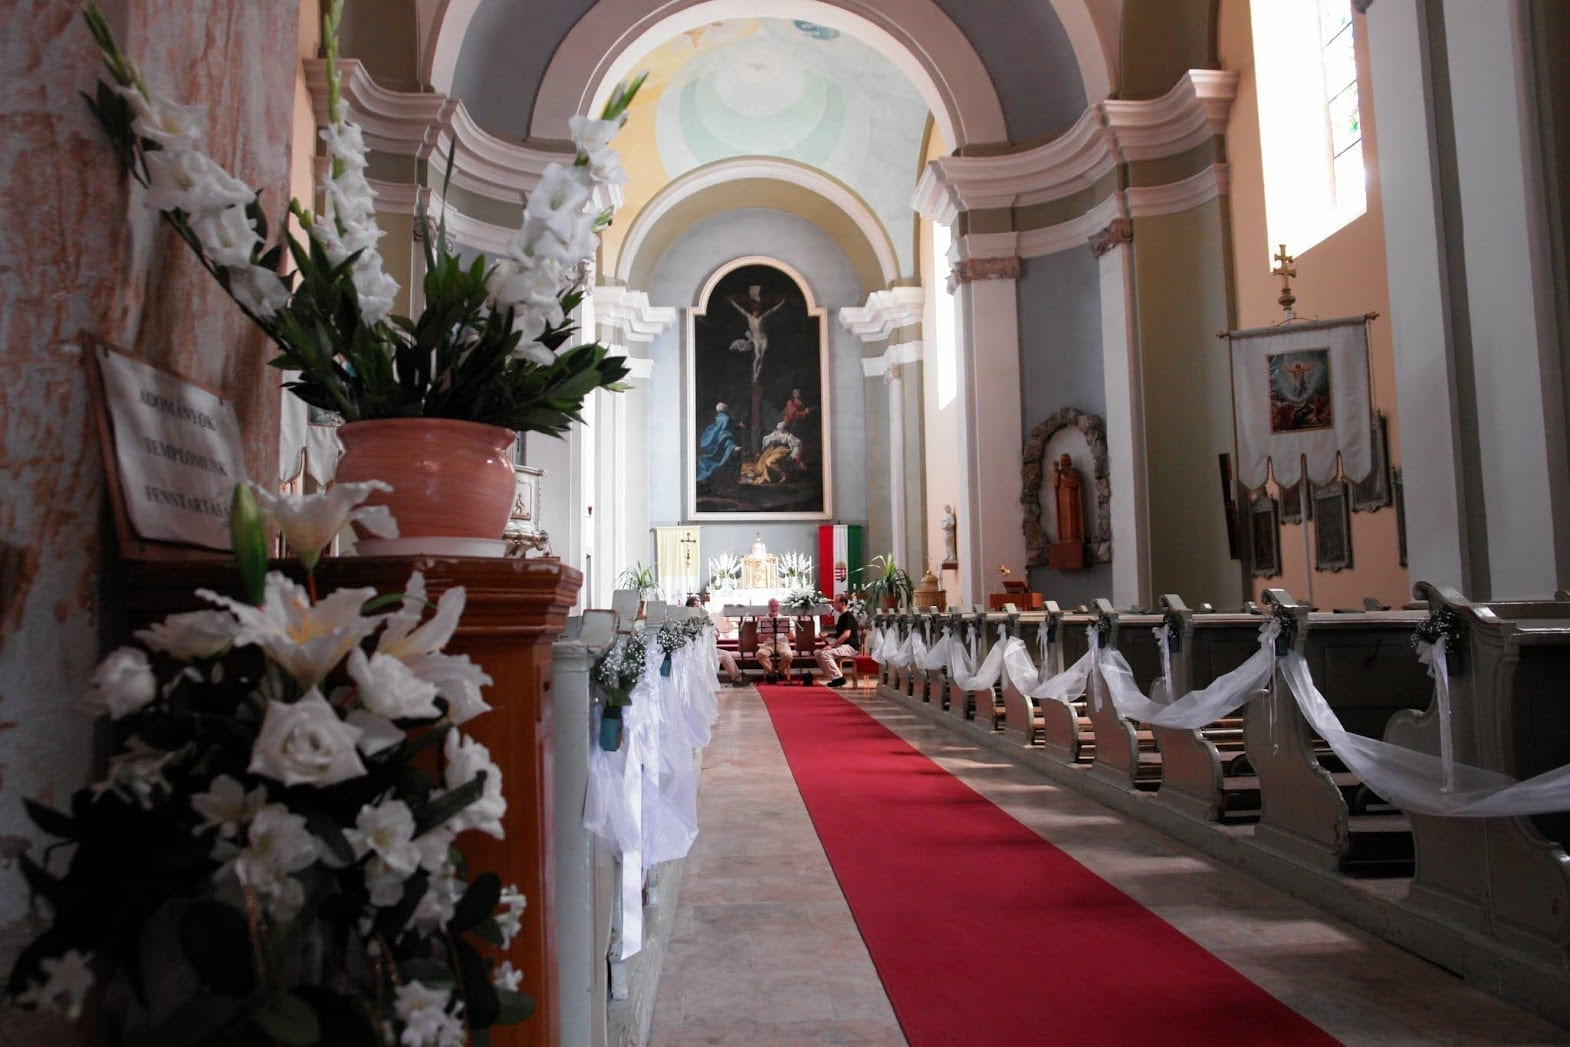 Iglesia parroquial de San Juan Bautista Visegrado Hungría